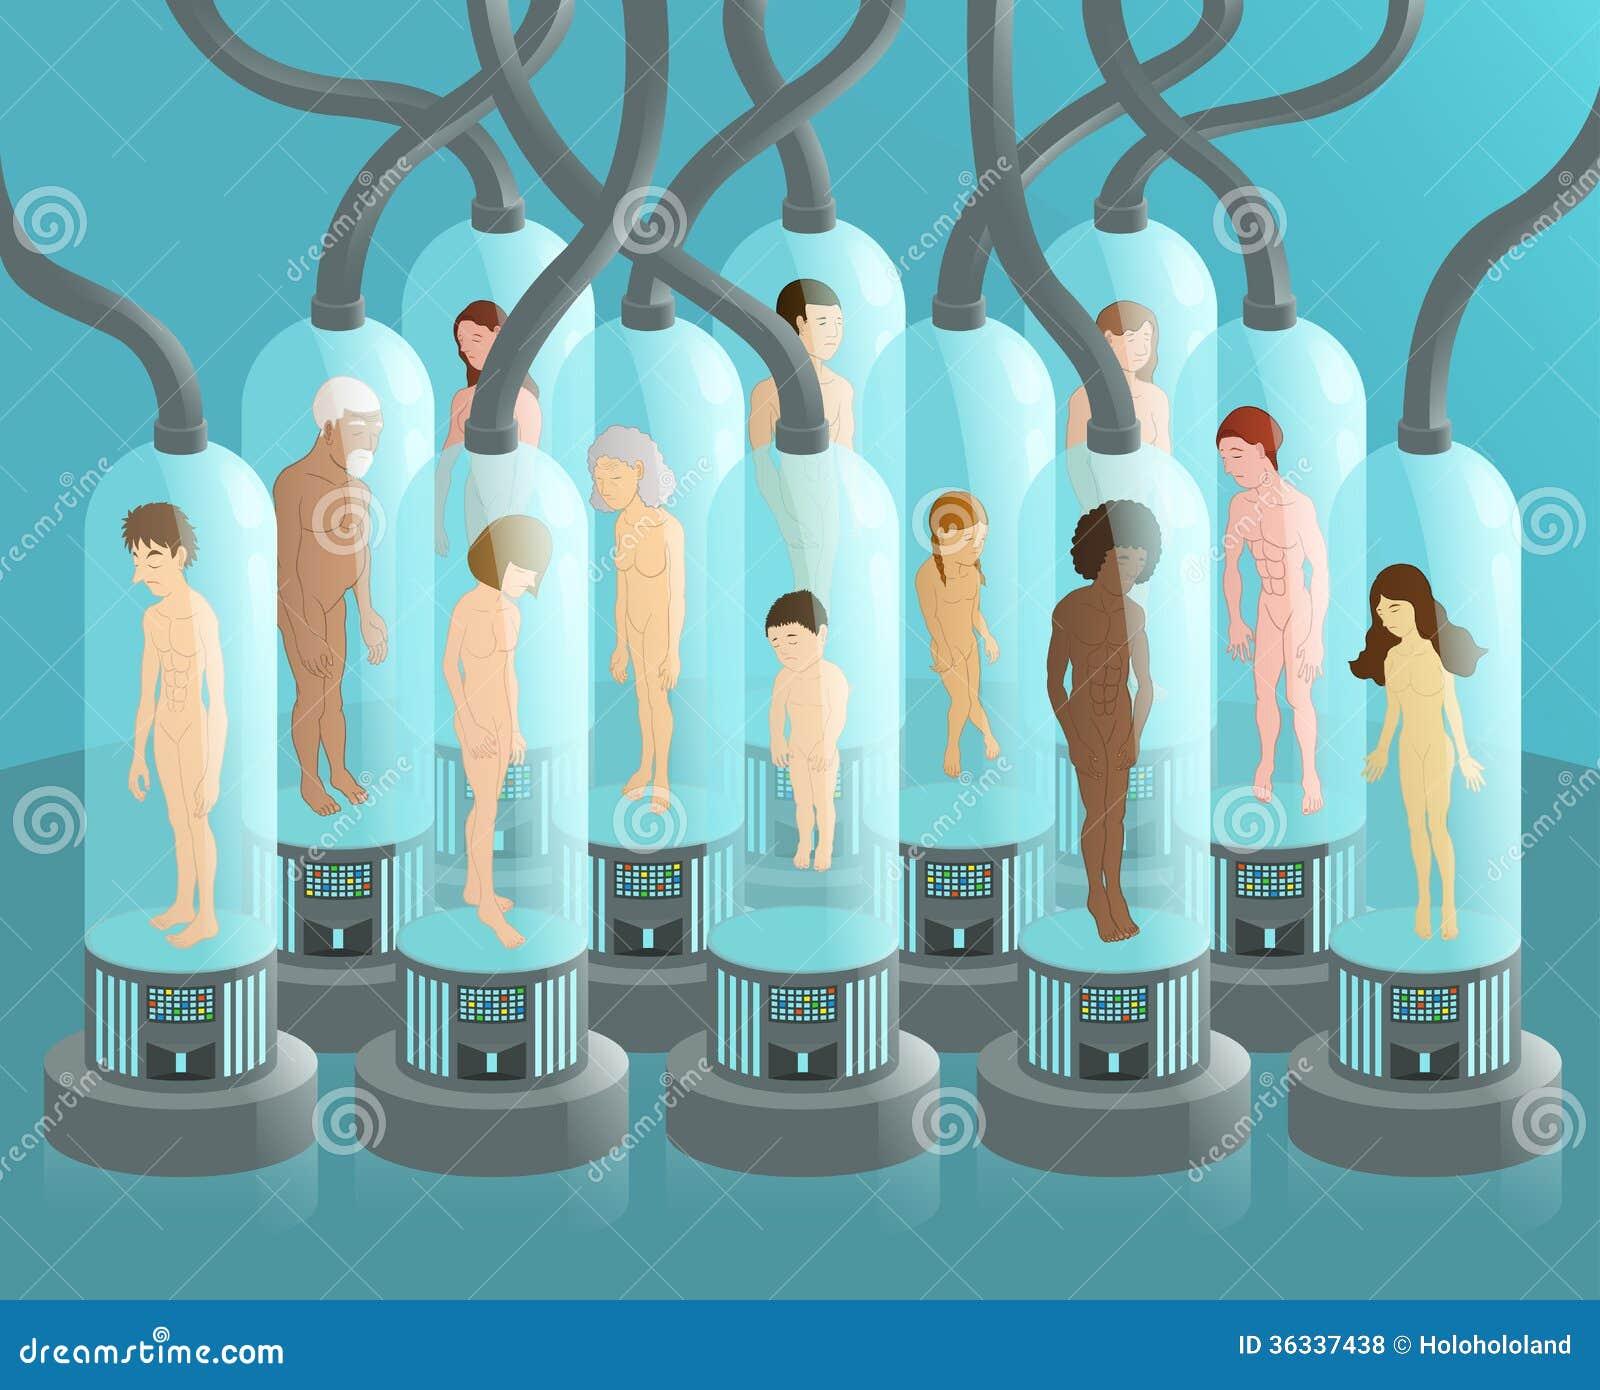 Royalty Free Stock Photos Human Test Tubes Testing Humans Alien Image36337438 on Cartoon Ufo Alien